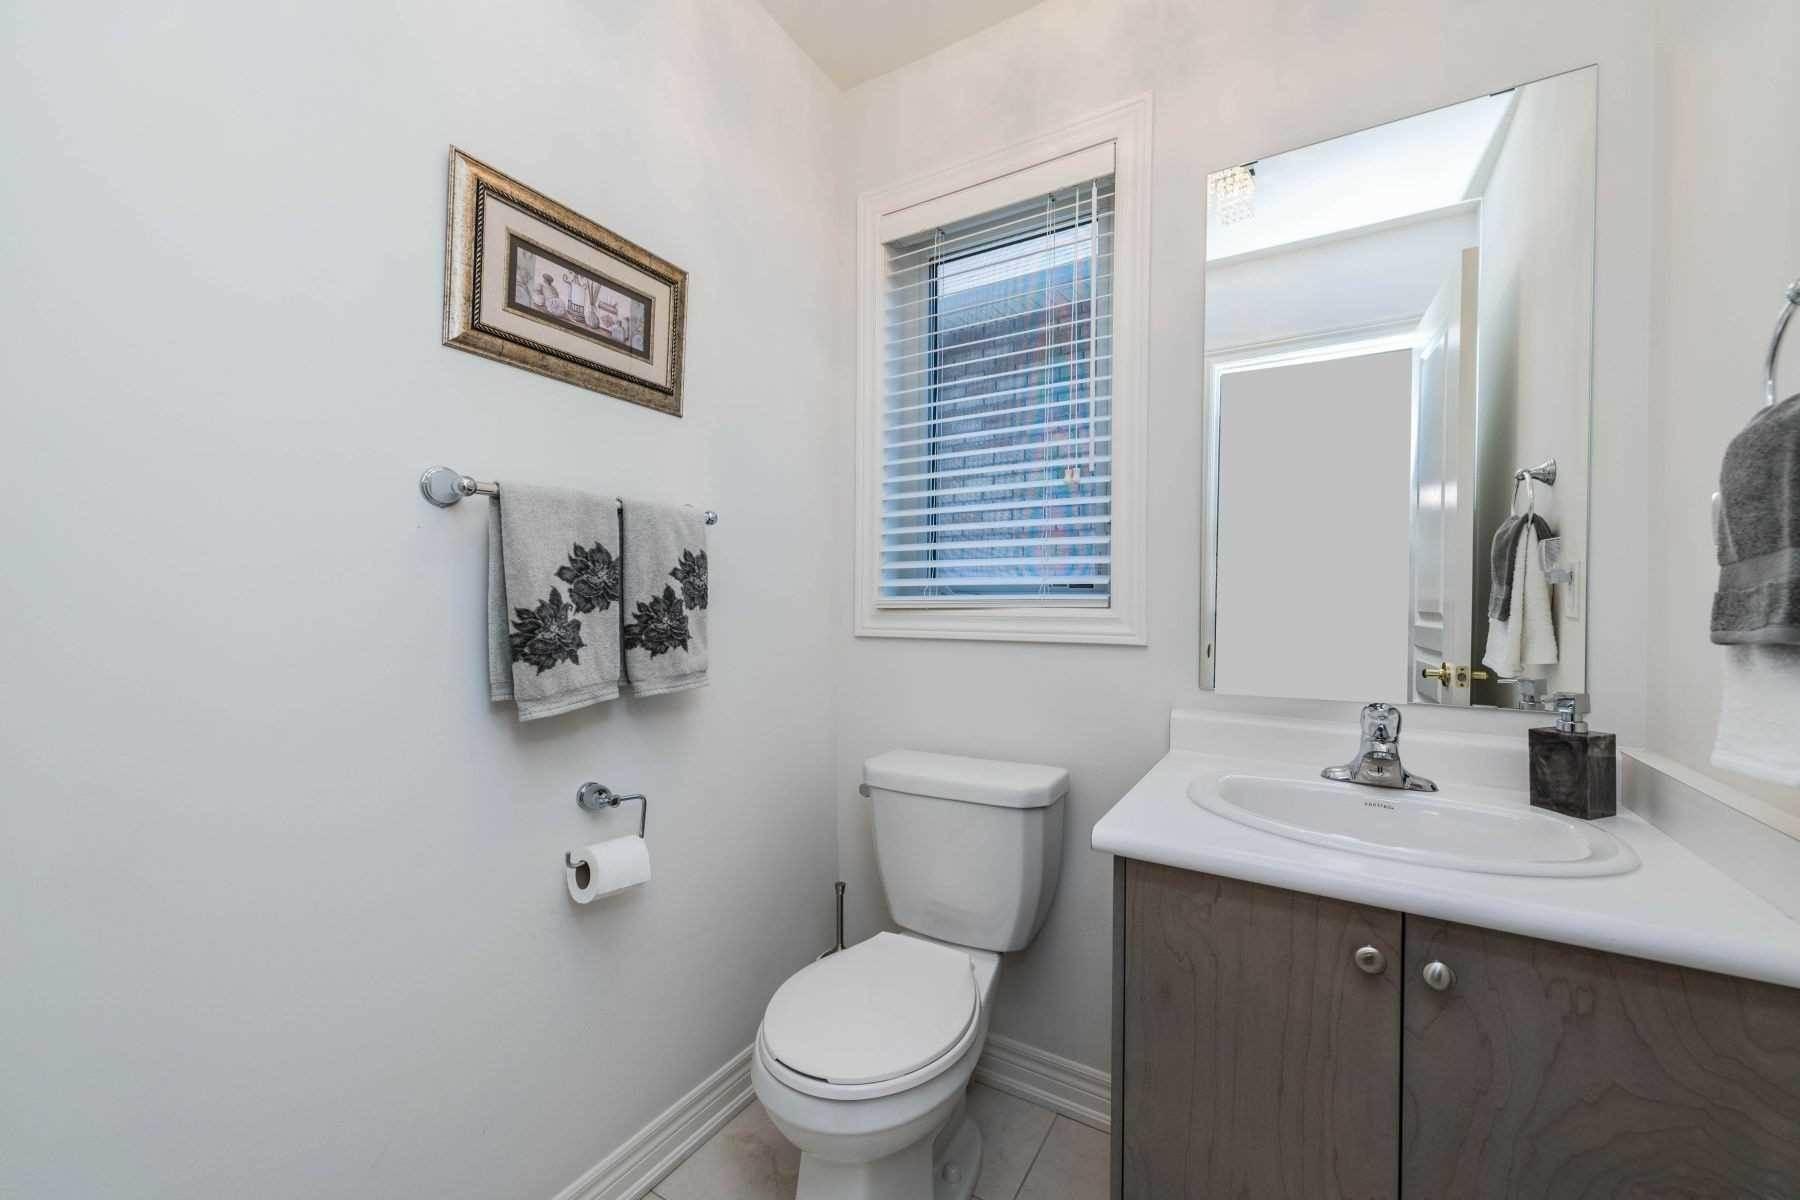 102 Lola Cres, Brampton House For Sale